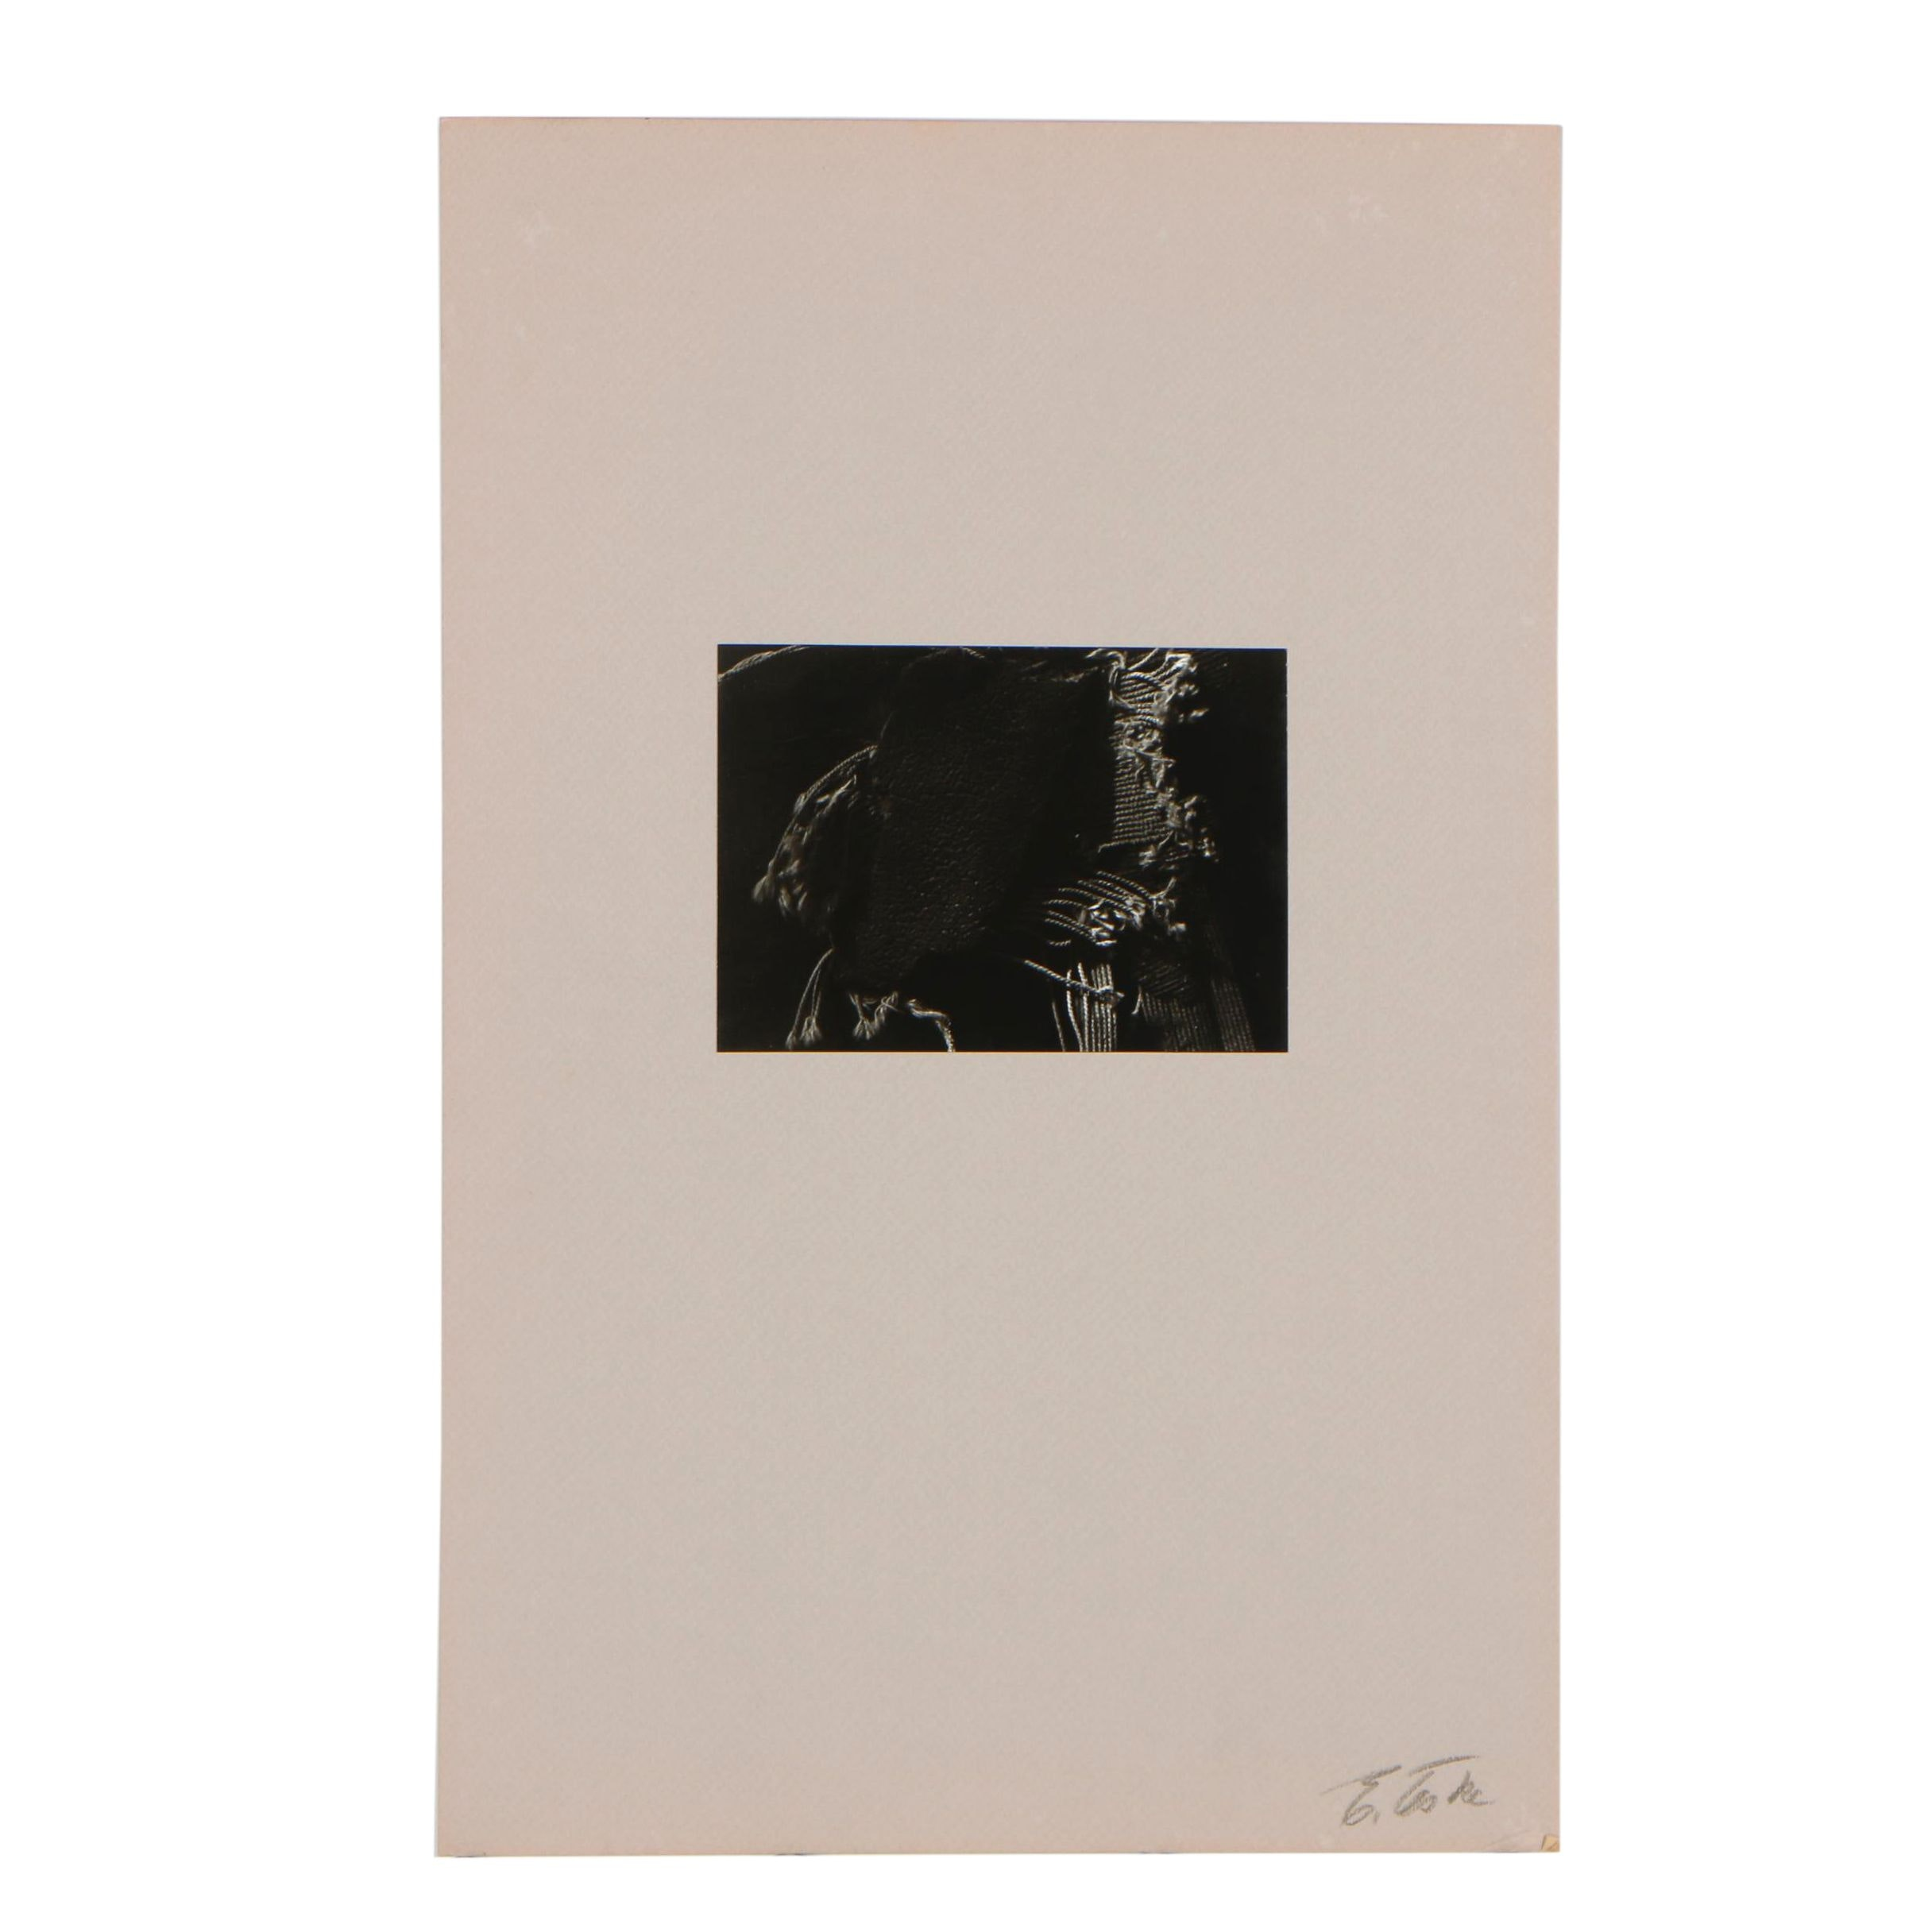 Edmund Teske Gelatin Silver Abstract Photograph